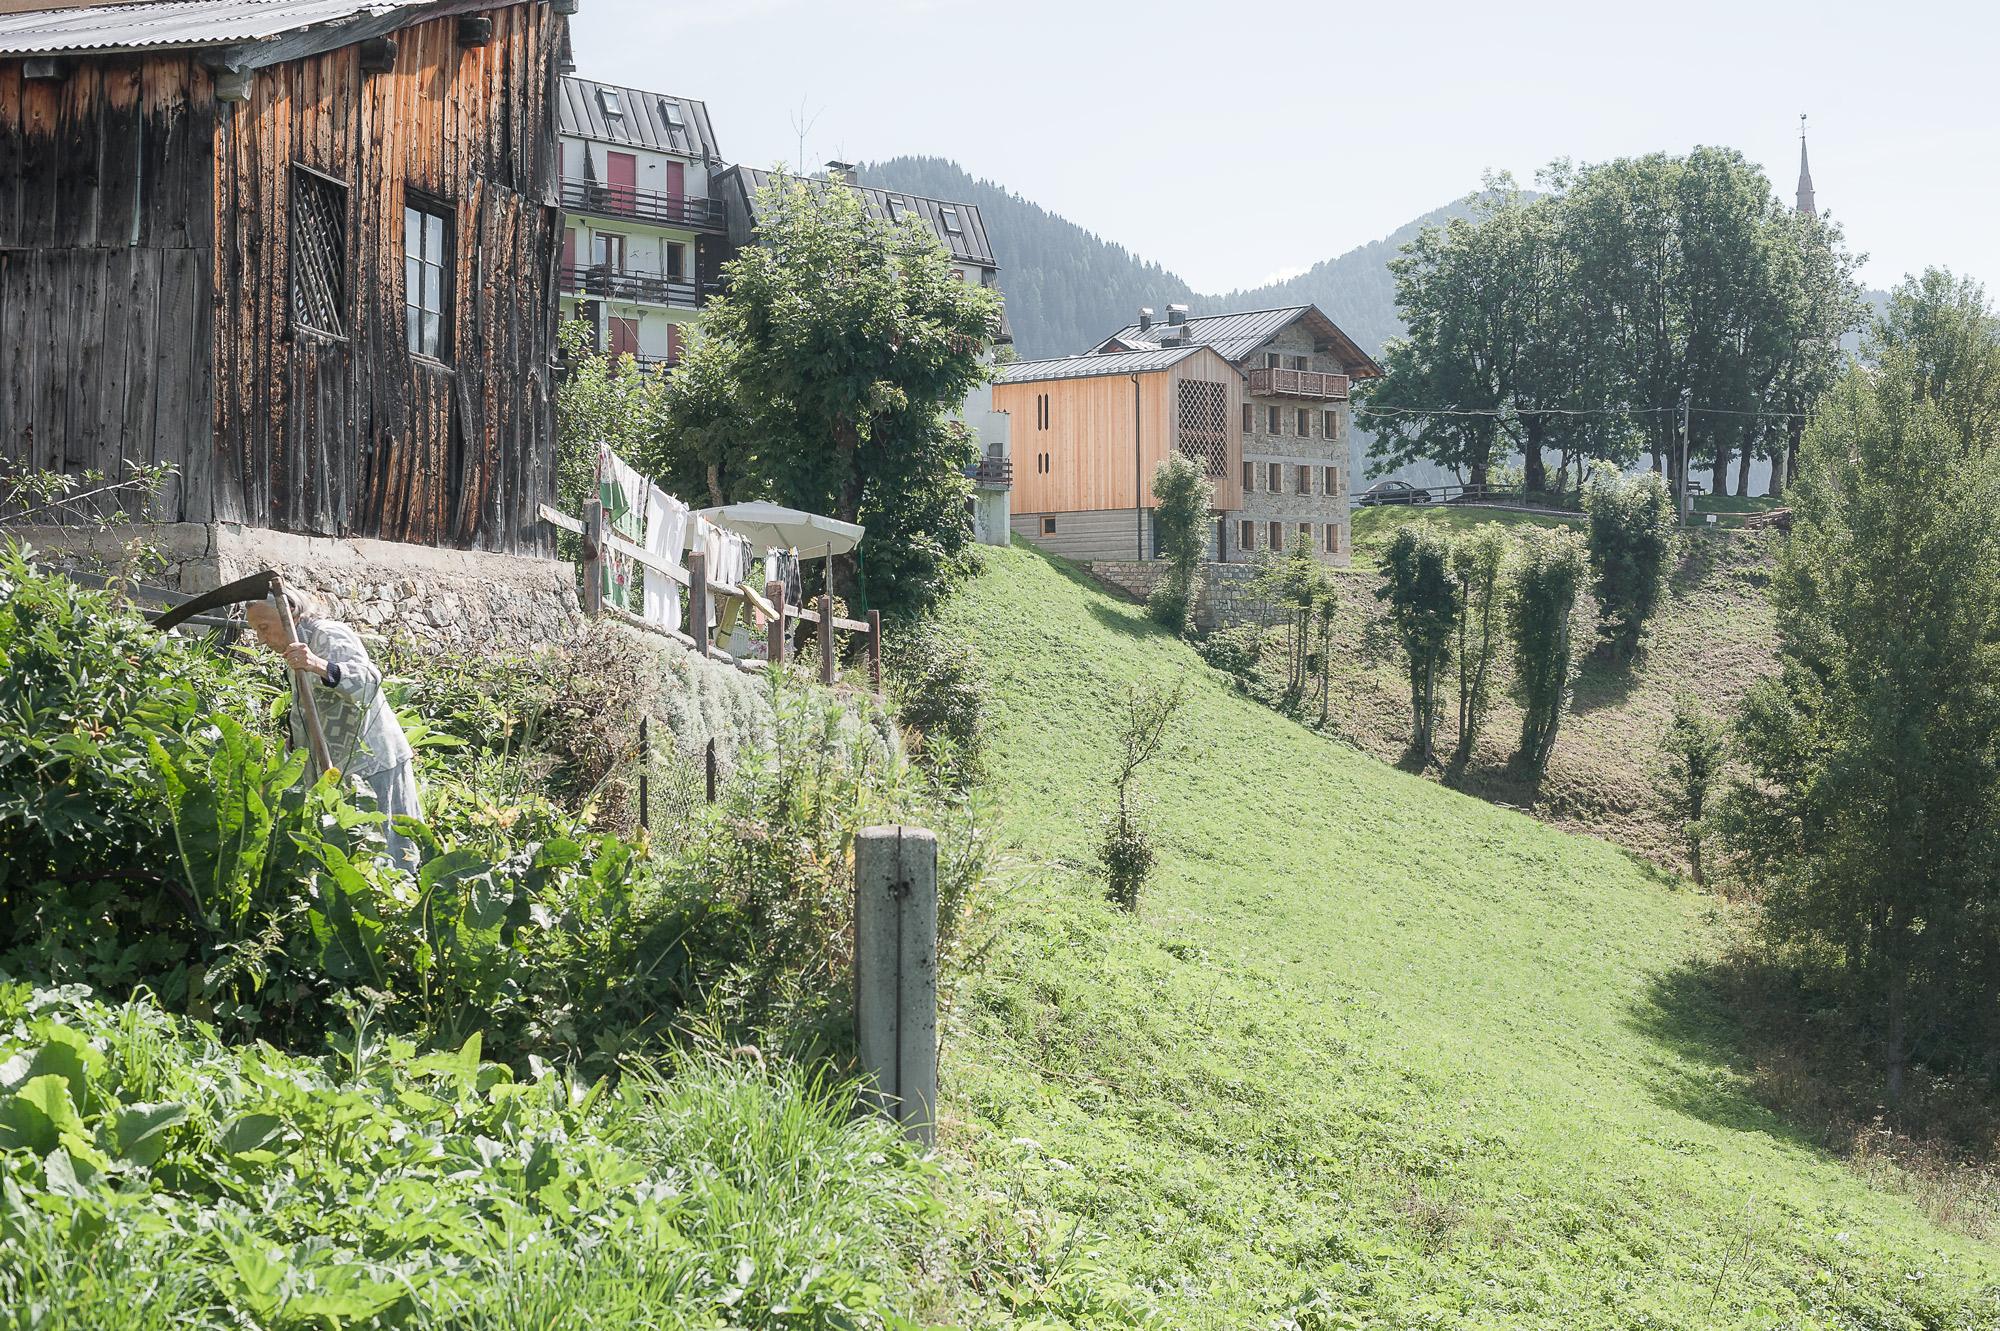 Gianin House, Clinicaurbana © Valentino Nicol